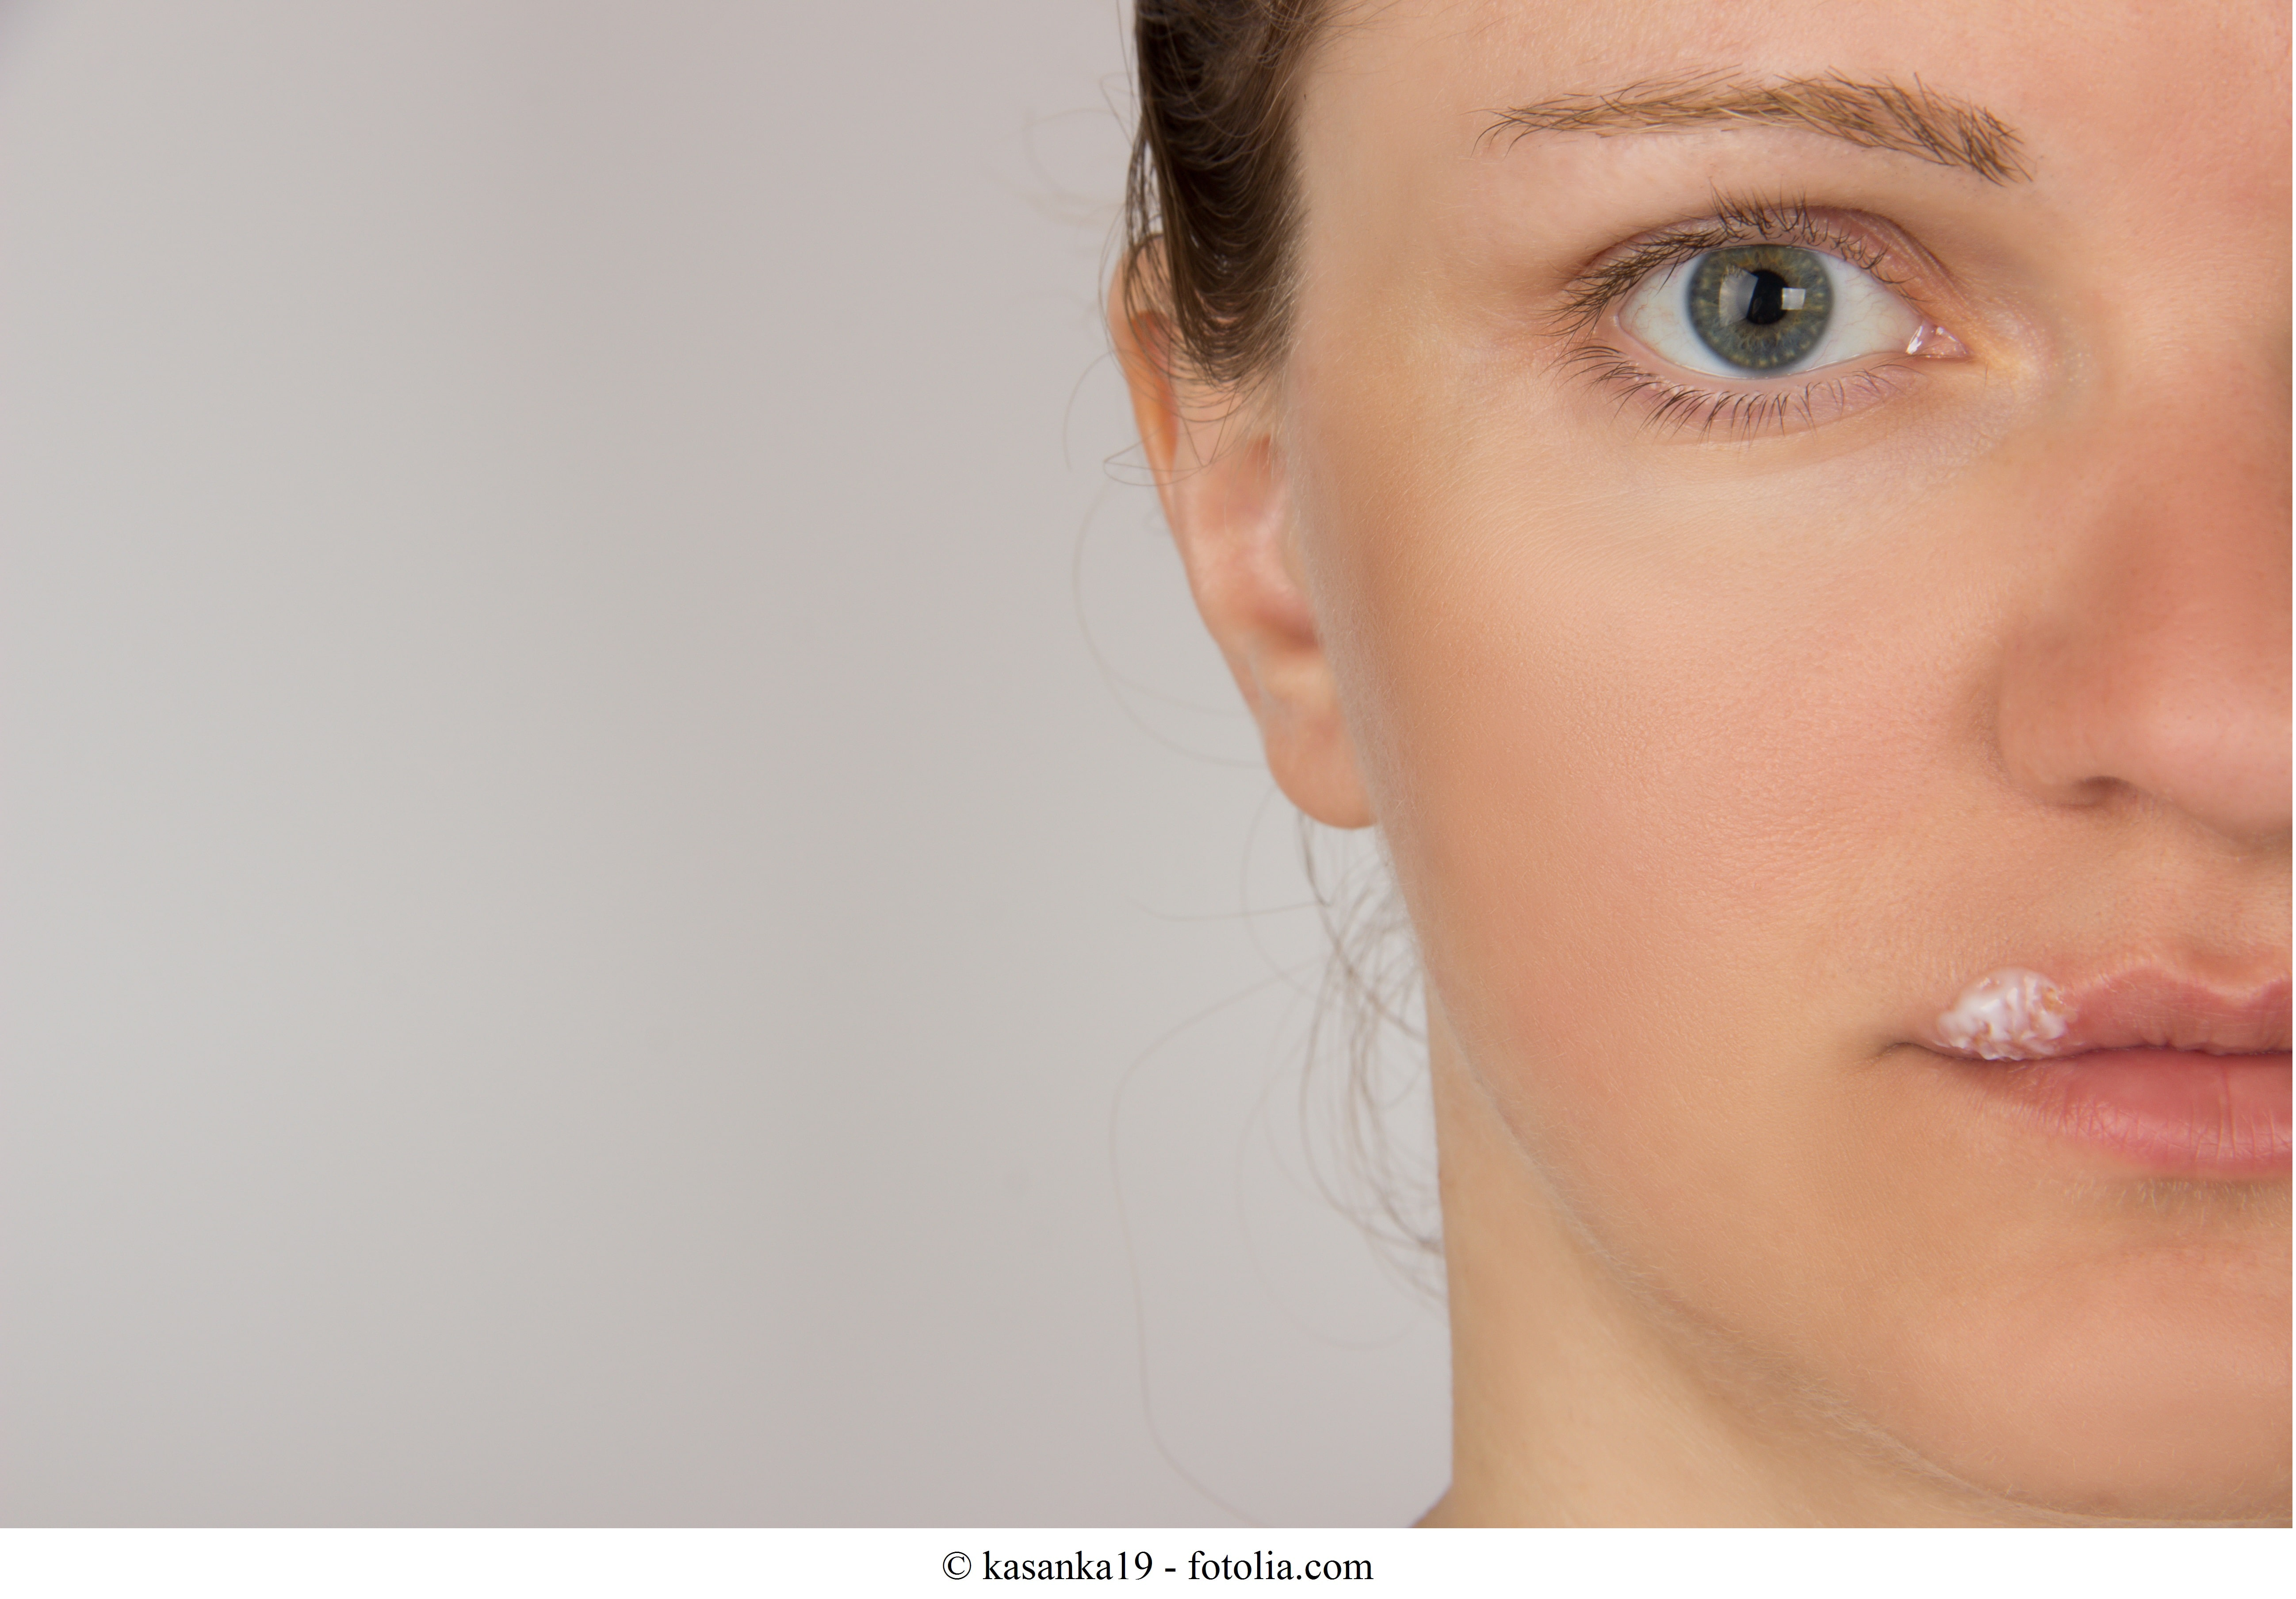 Lippenherpes oder Herpes labialis